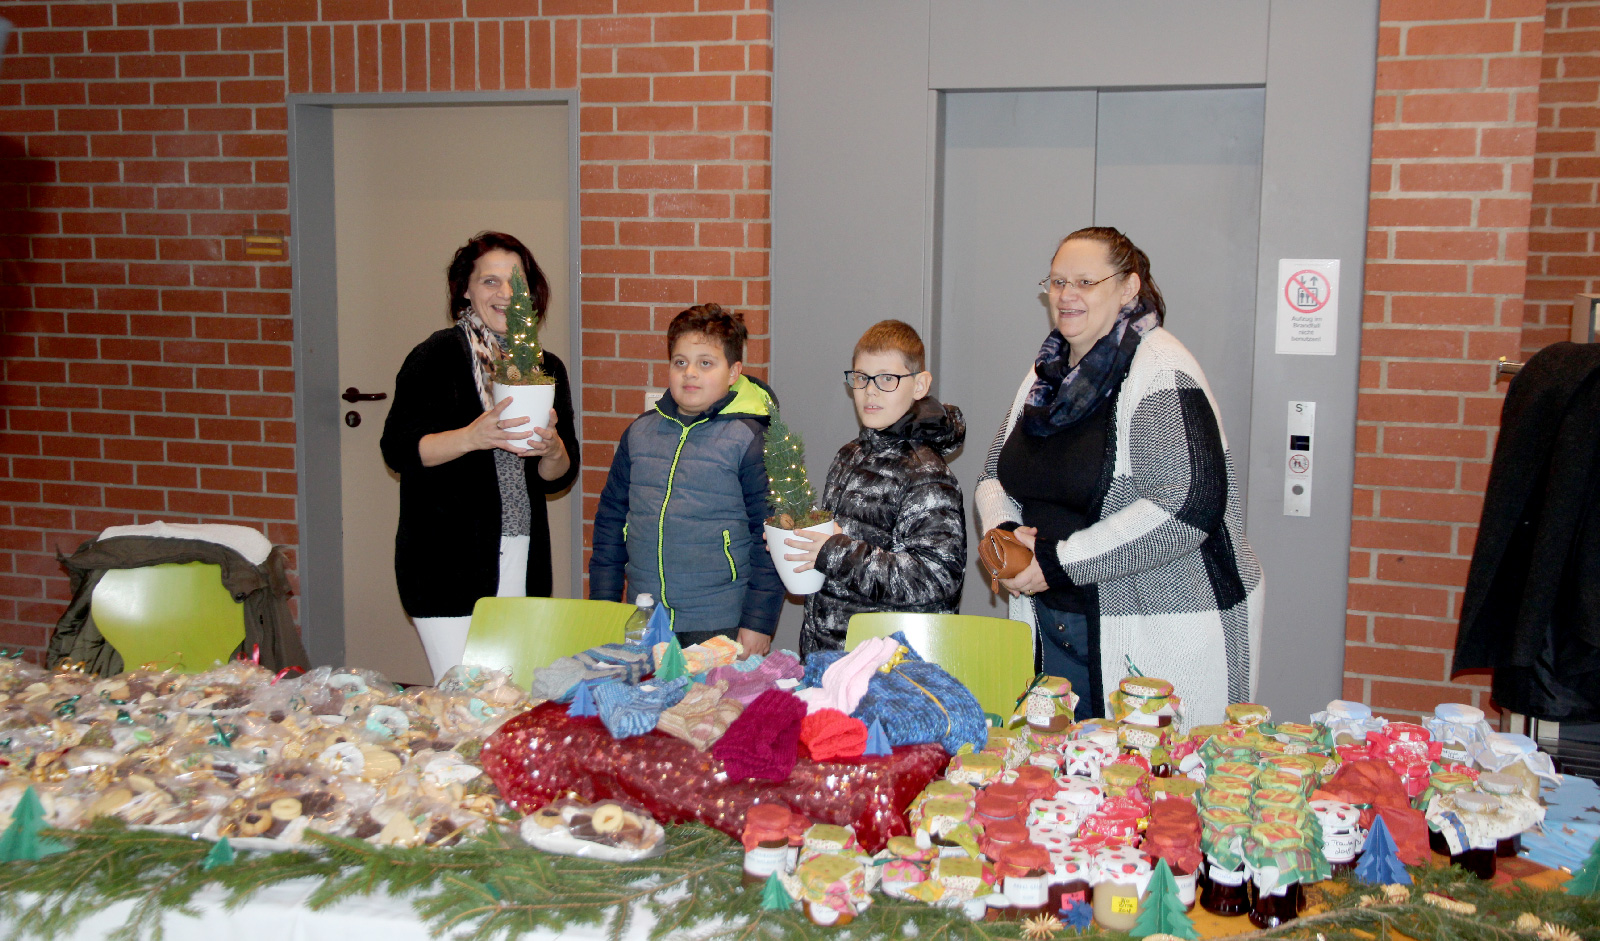 Plätzchen oder Handarbeiten: Produkte des Elternbeirats der Dr. Bernhard Leniger Schule kamen bei den Besucher gut an.